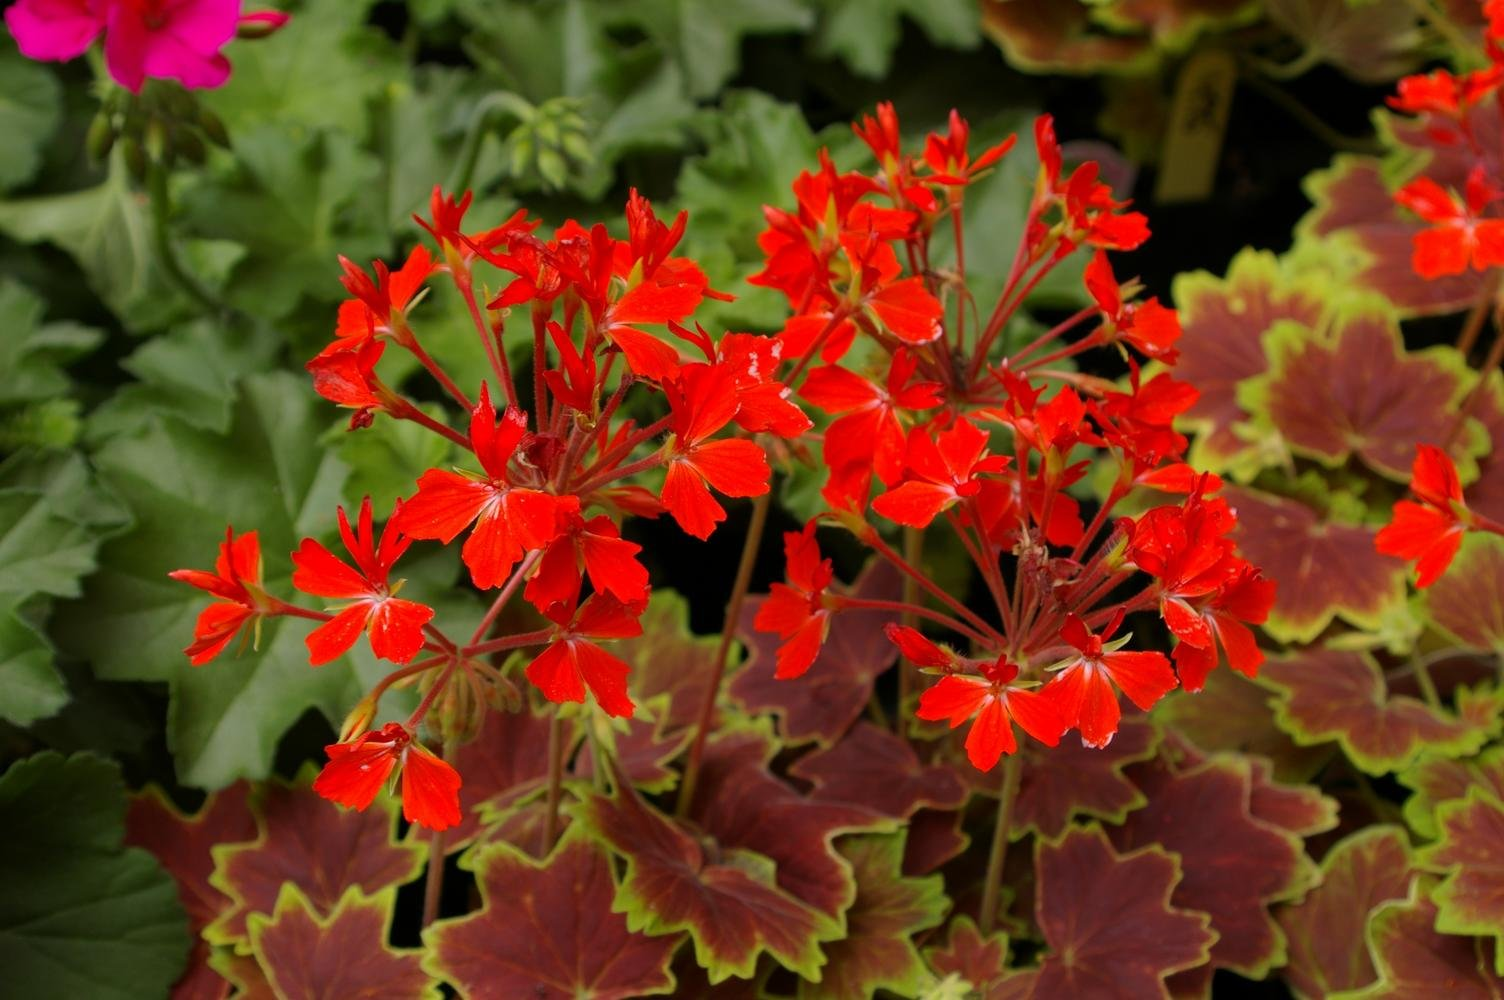 Zonal geranium vancouver centennial 101 plants amp things